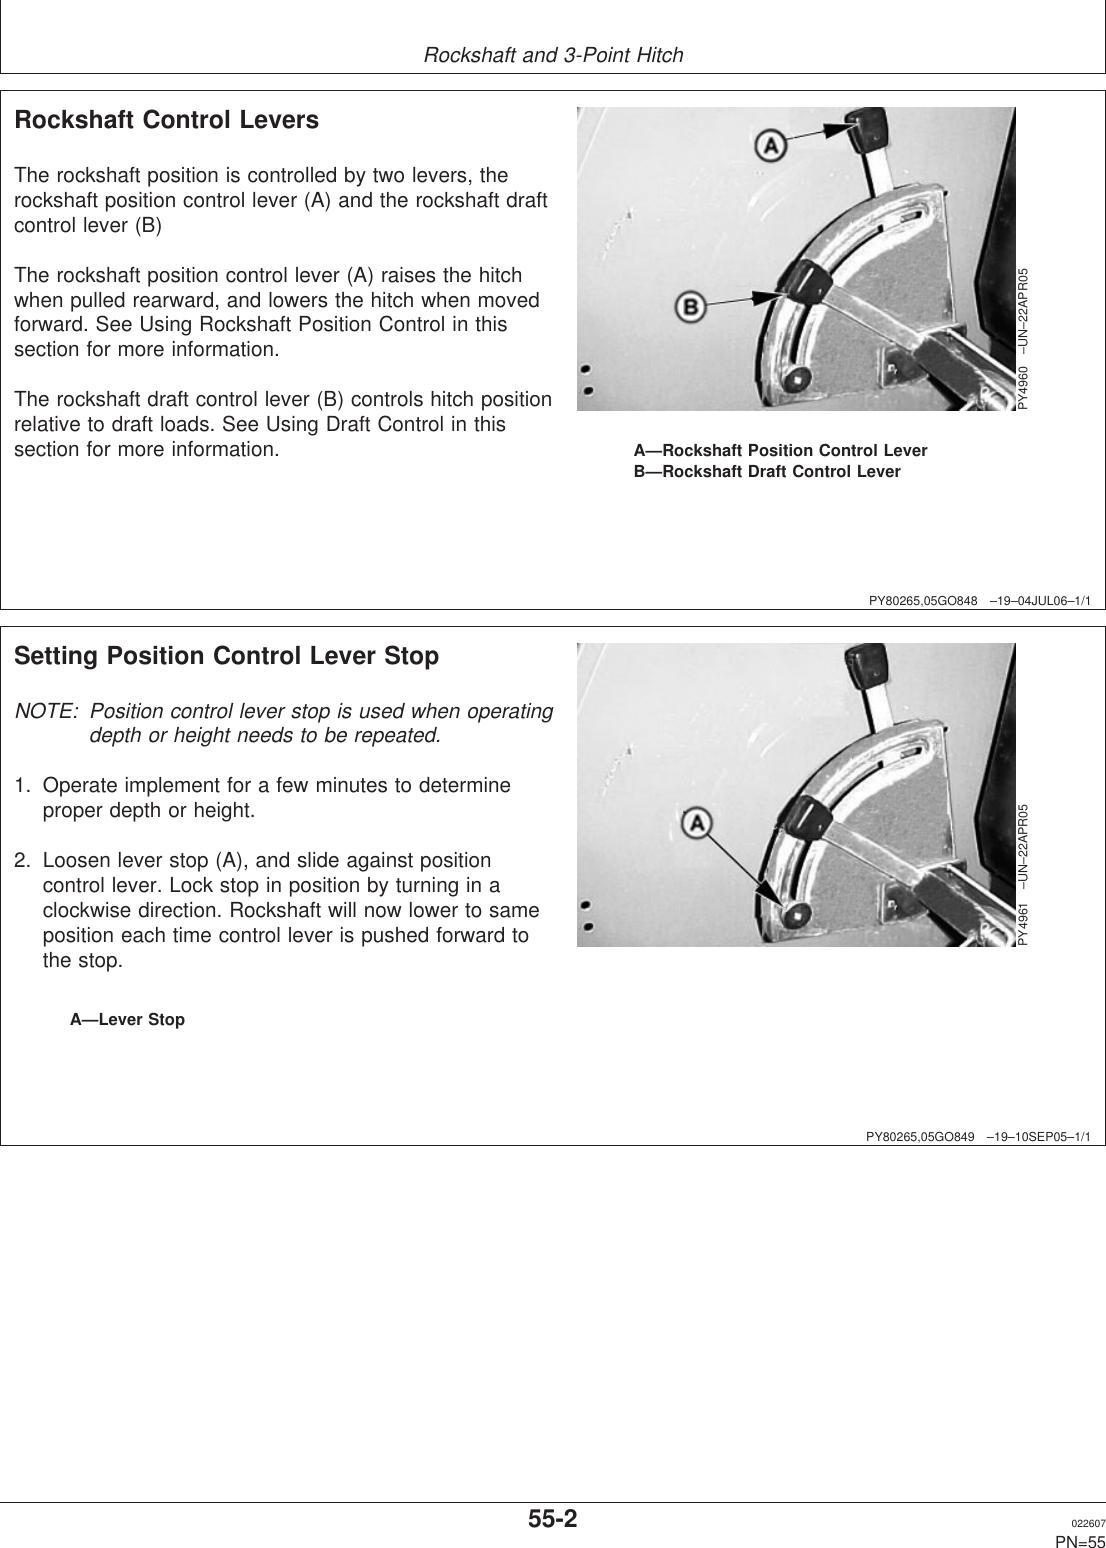 John Deere 5103E 5103 5103S 5203 5104 5204 Users Manual 043025UNIT